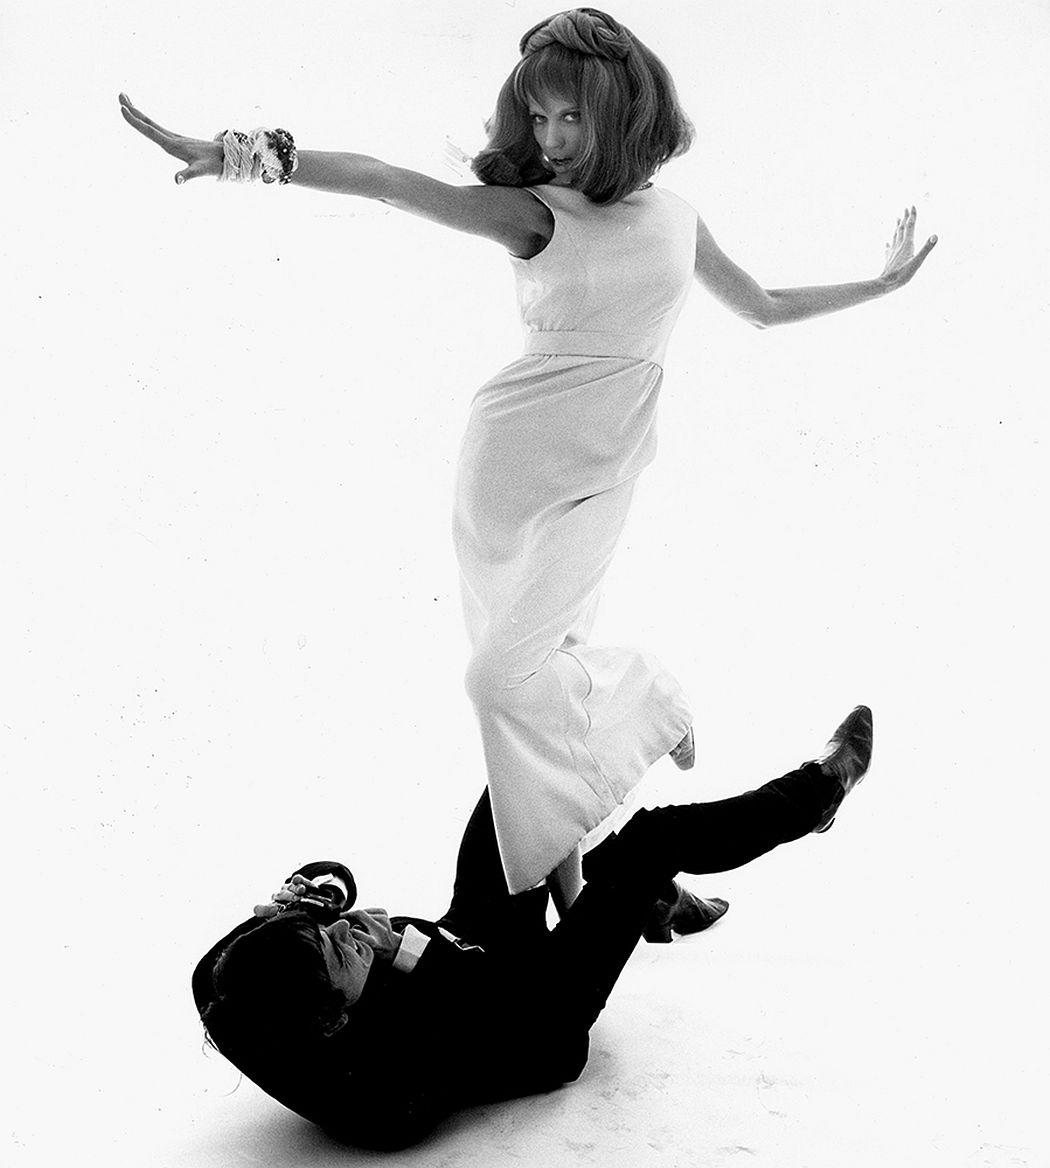 Bert Stern  David Bailey and Veruschka, VOGUE, New York, 1964